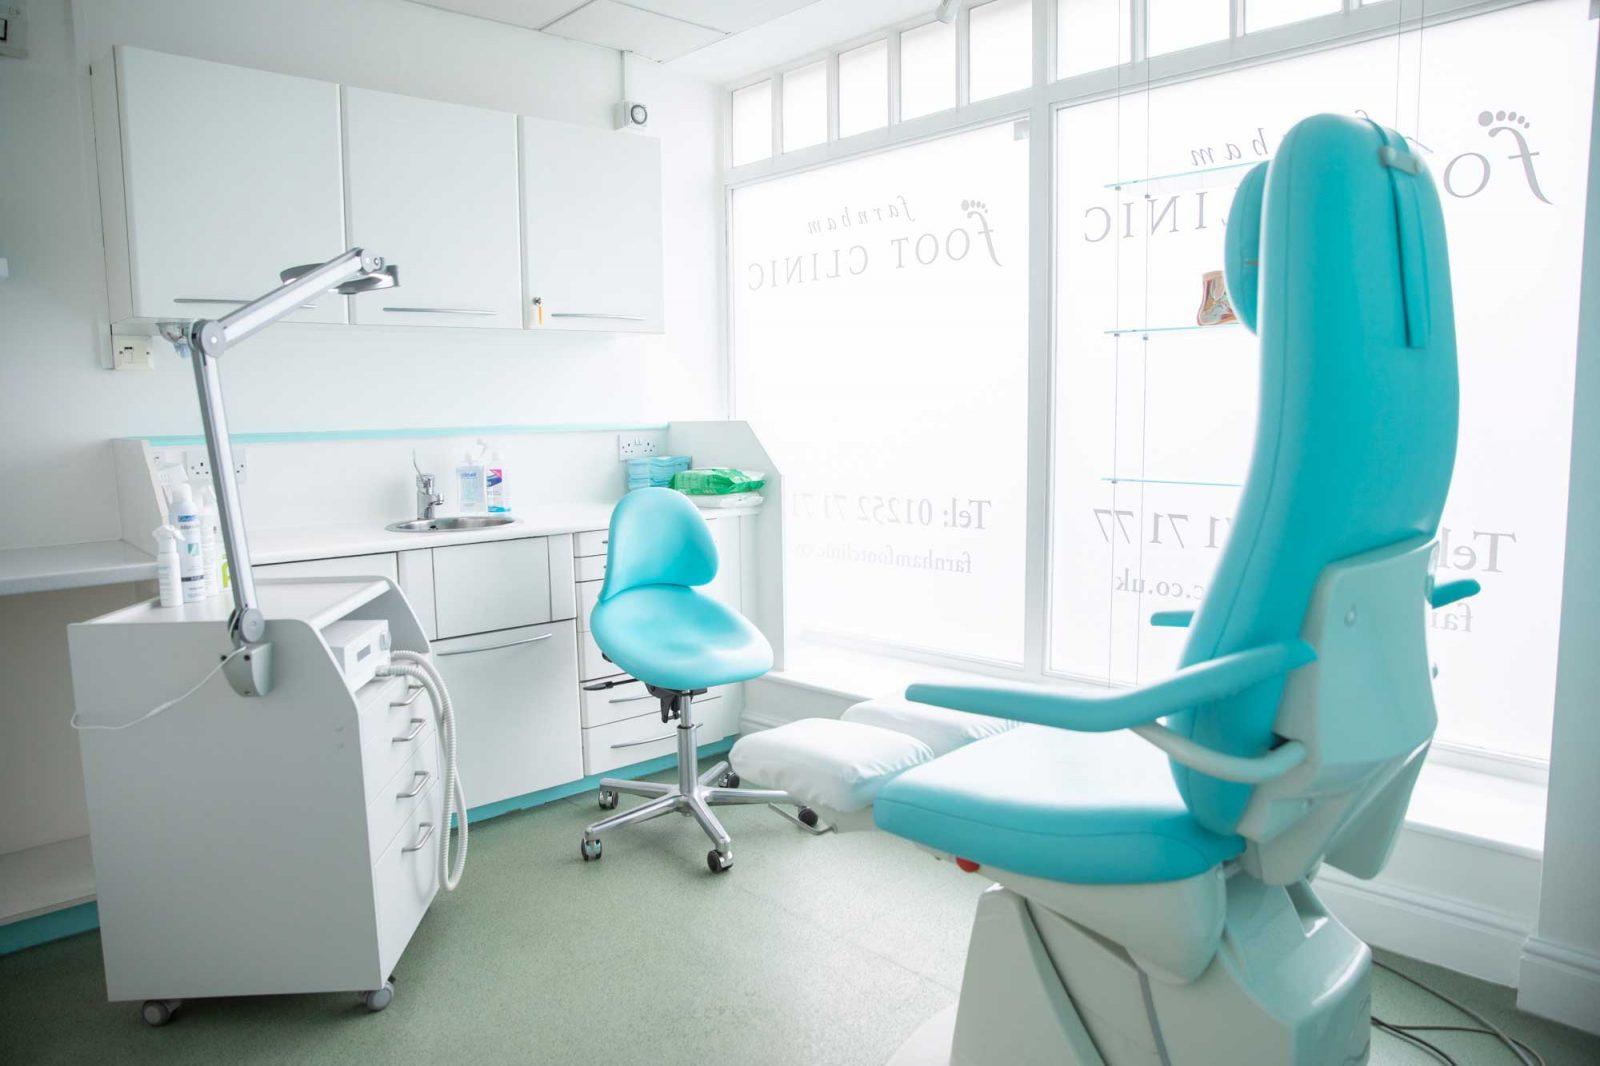 About Farnham Foot Clinic